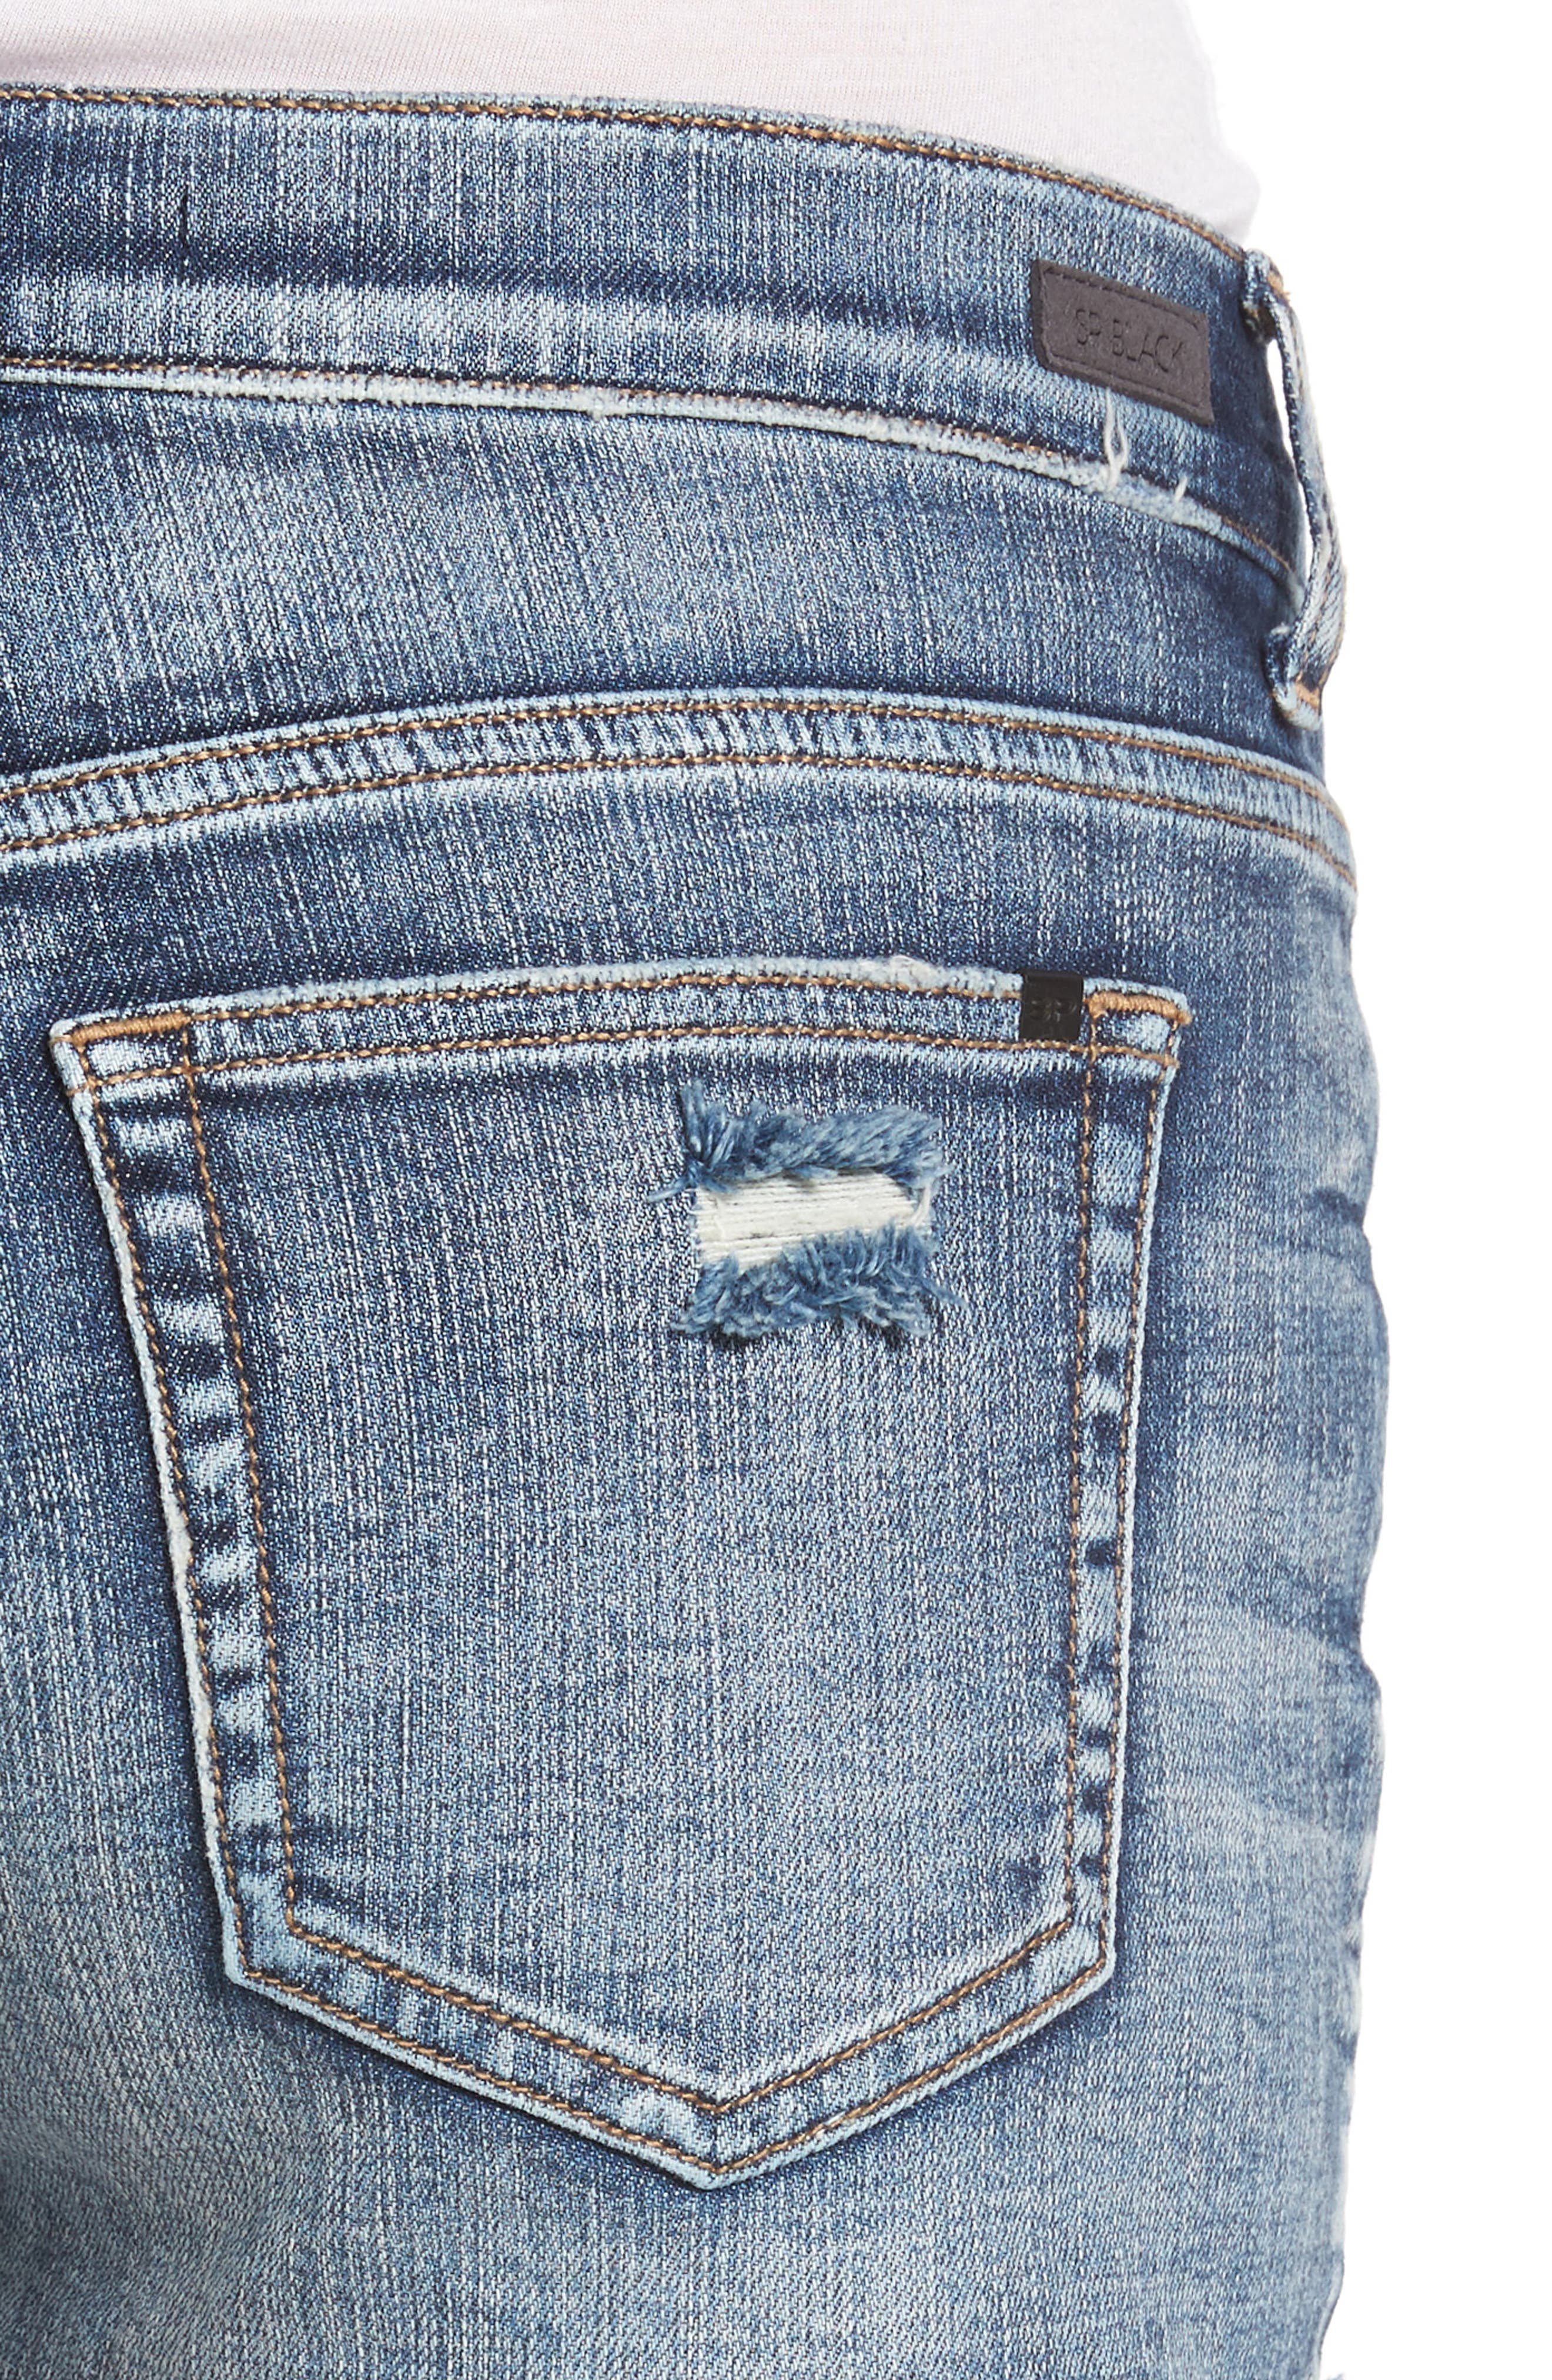 Stars & Sripes Denim Shorts,                             Alternate thumbnail 4, color,                             Medium Wash